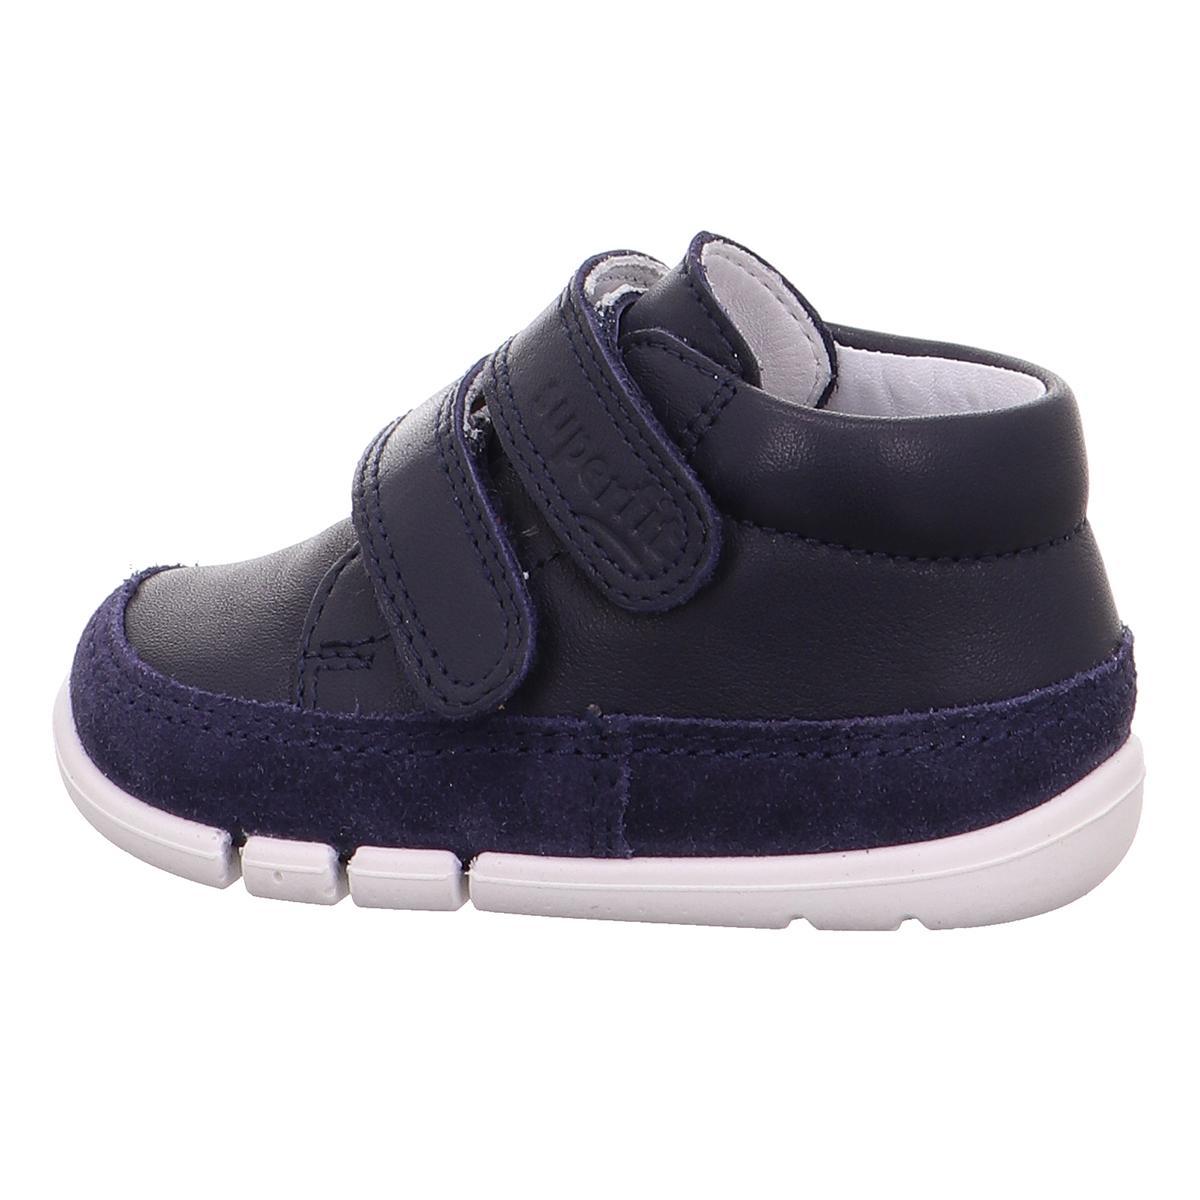 Купить Пинетки-ботинки Superfit Sport Blue, р. 21 1-006341-8000 ТМ: Superfit, синий